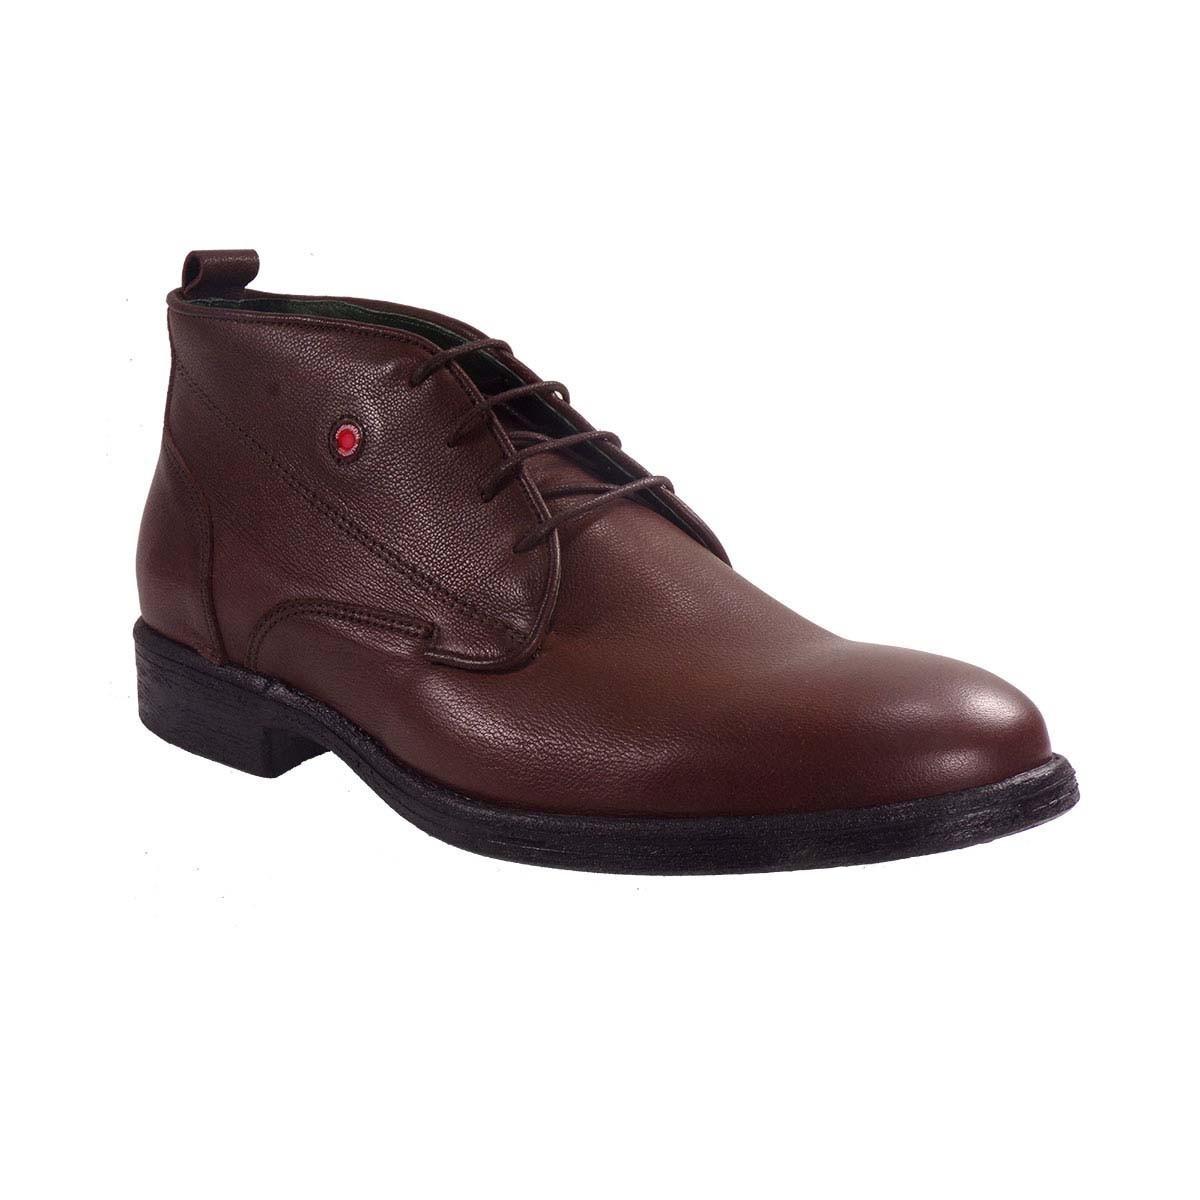 Robinson Ανδρικά Παπούτσια Μποτάκια Αρβυλάκια 1796 Καφέ Δέρμα